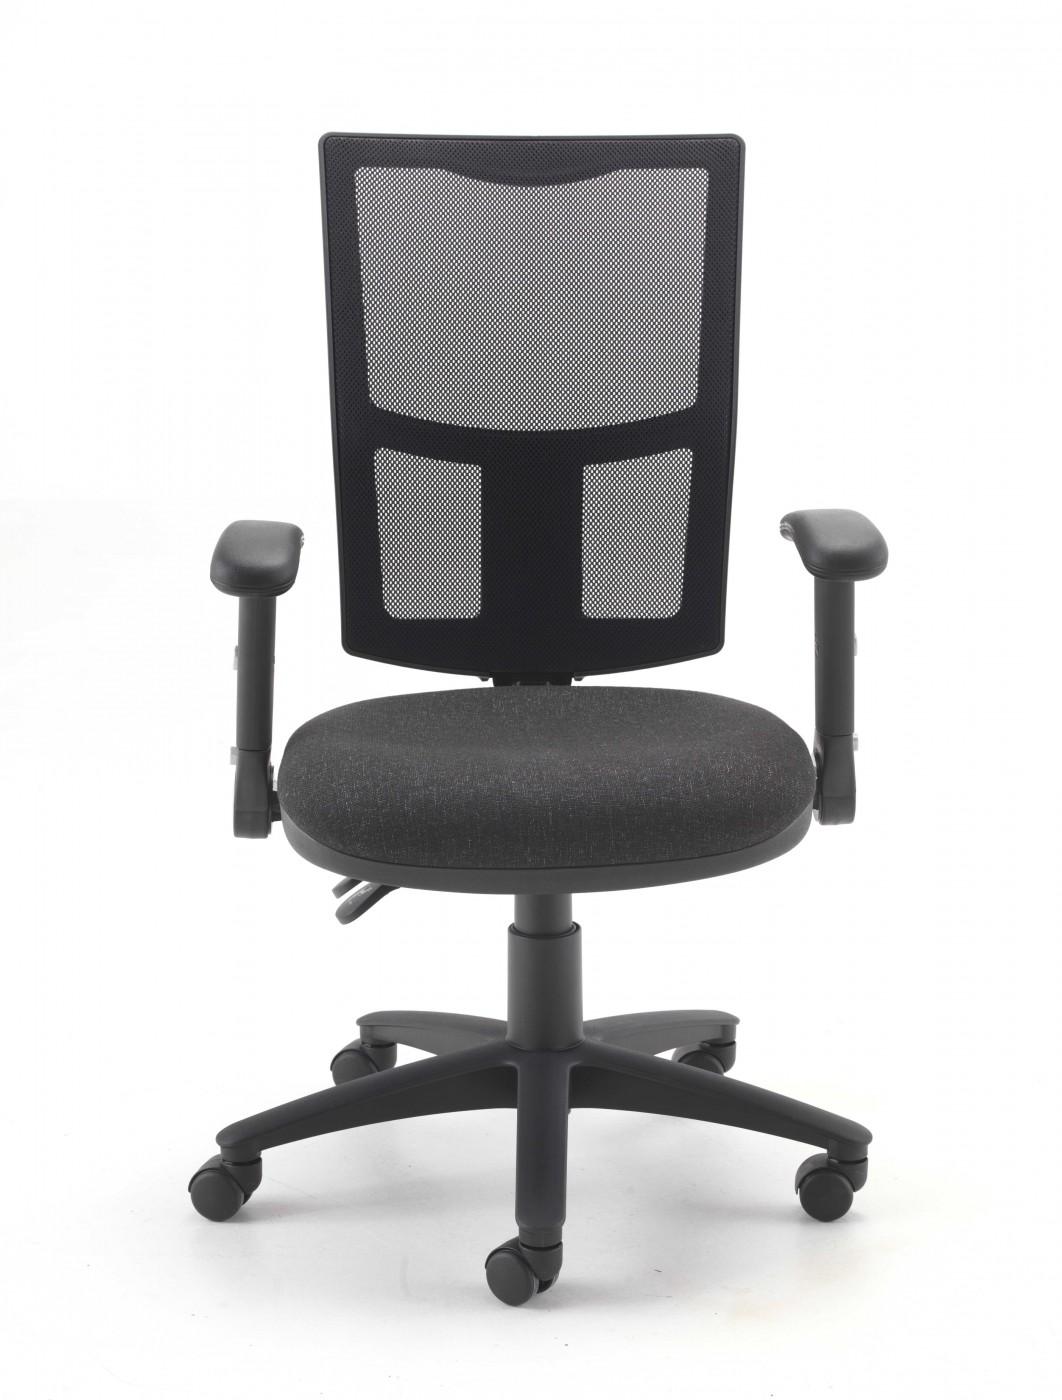 office chair mesh table design tc ch2803 43ac1082 121 furniture